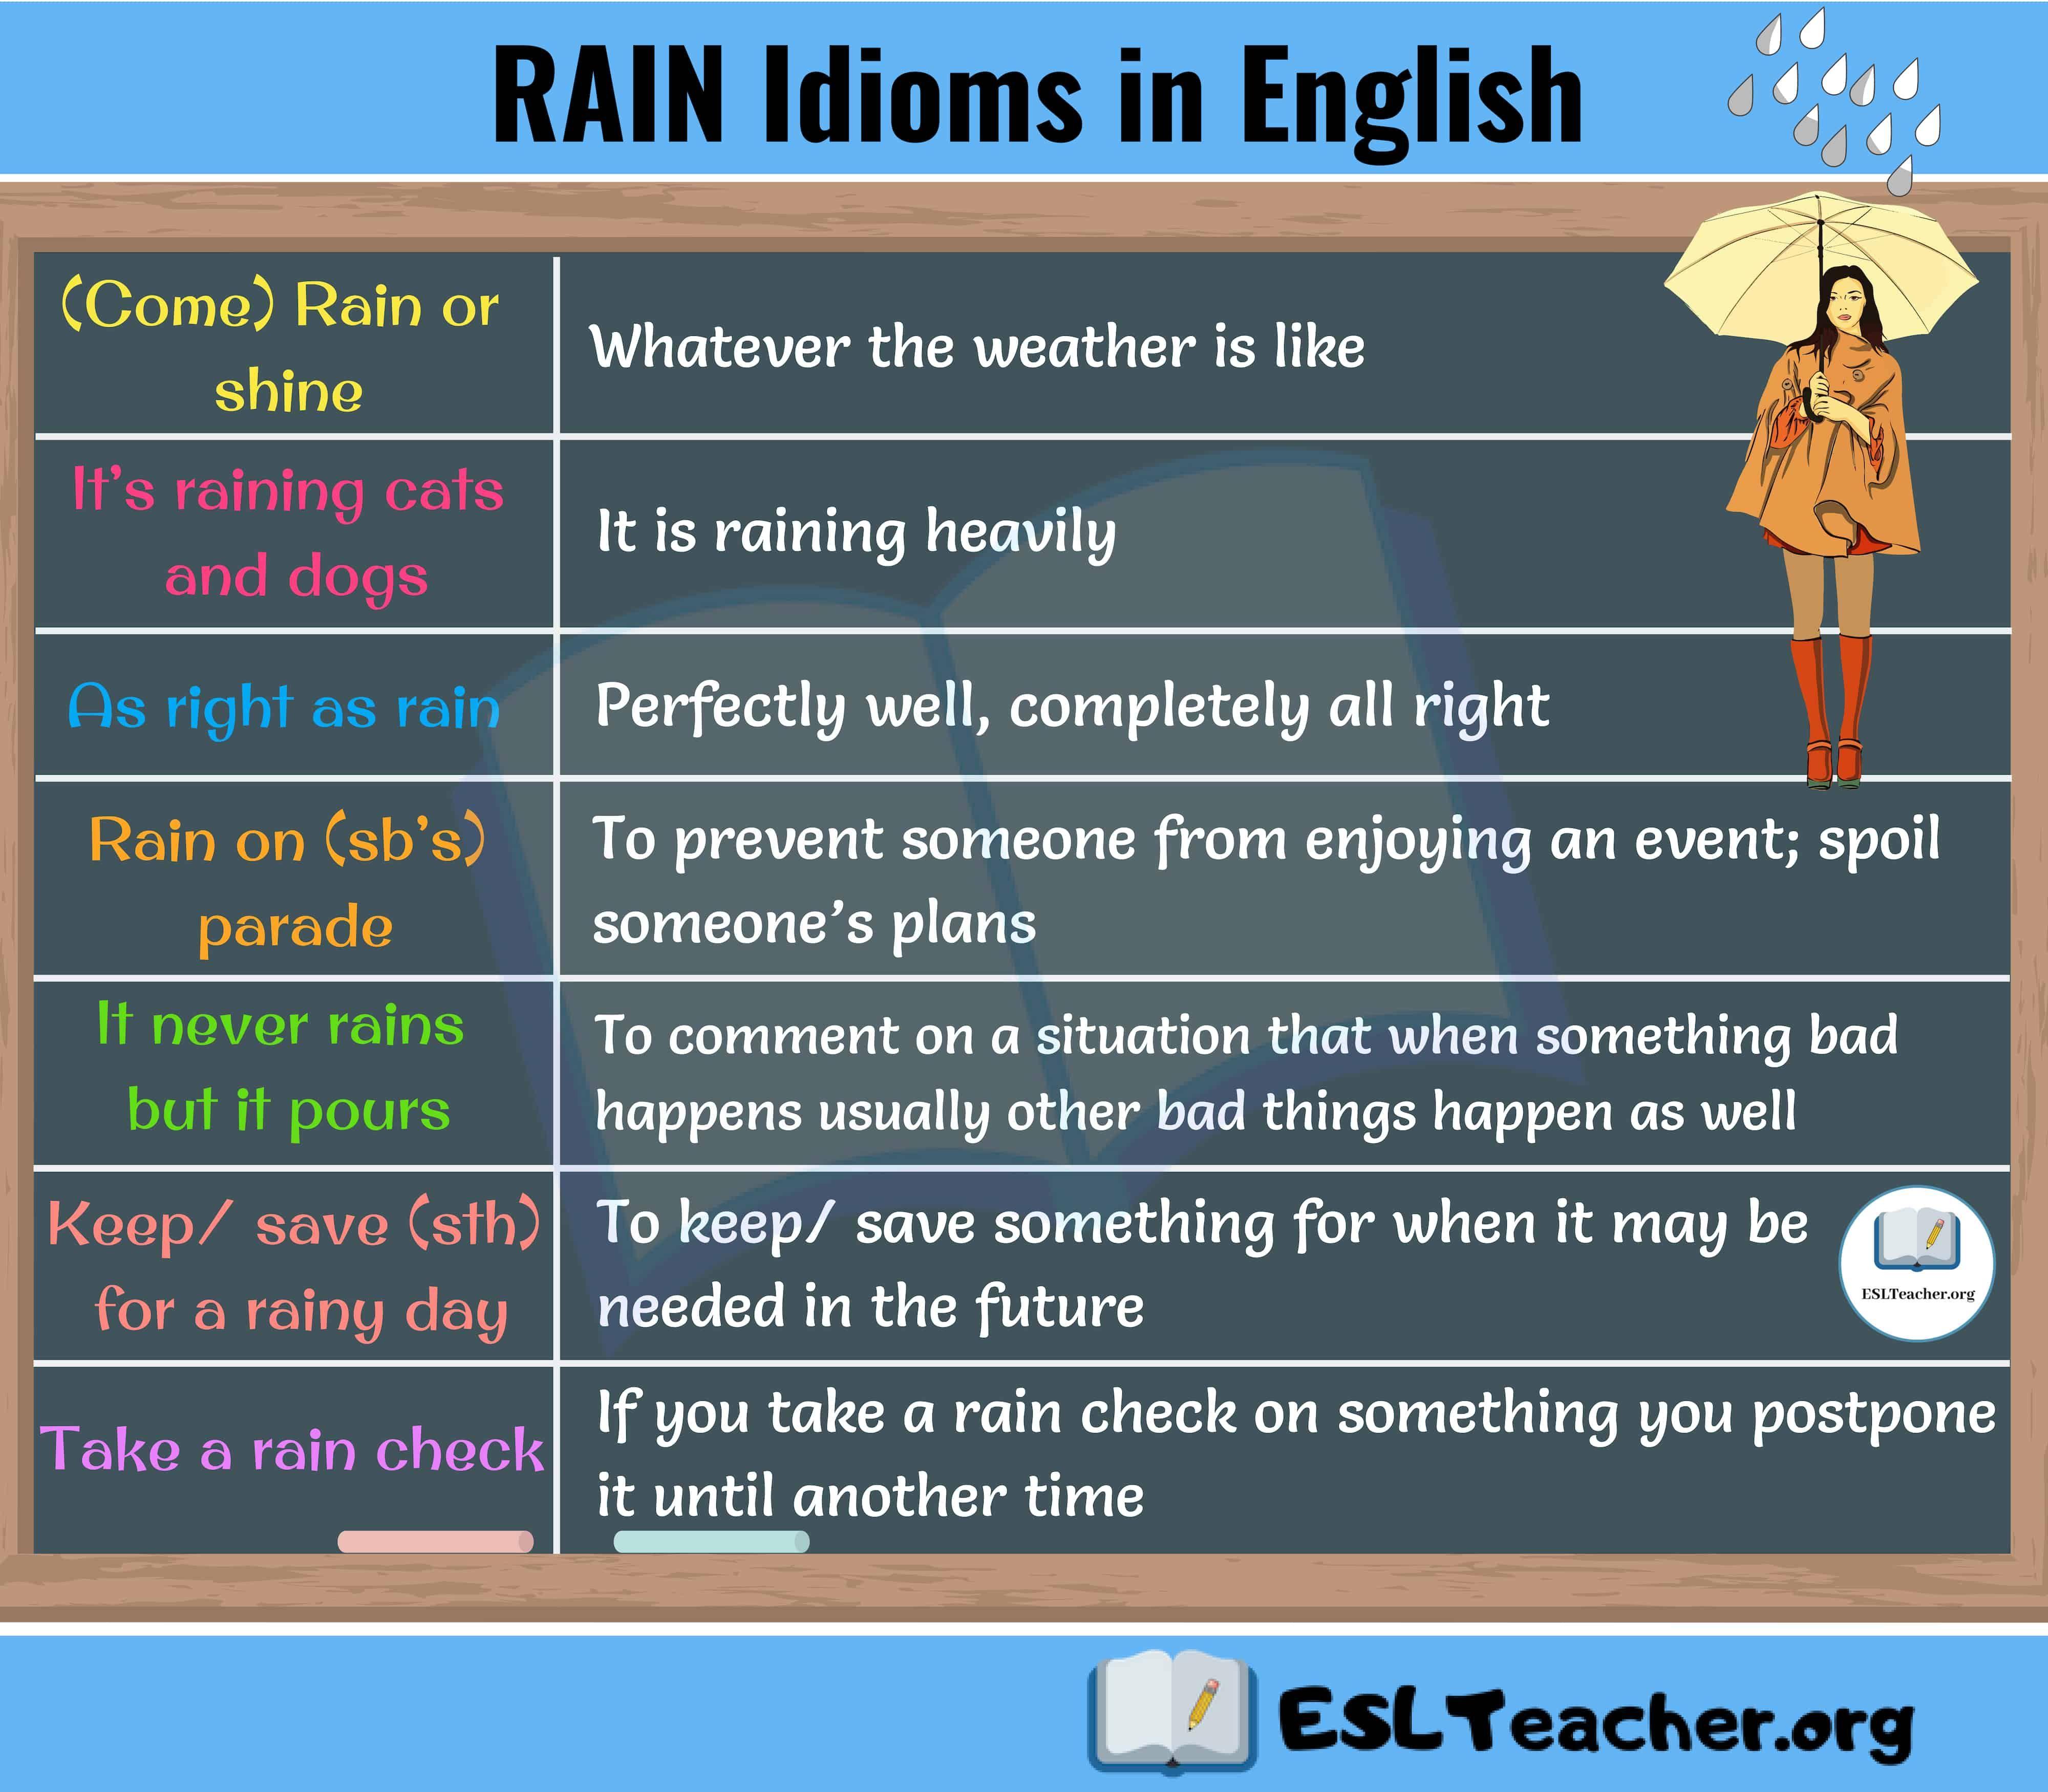 Rain Idioms 7 Interesting Rain Idioms You Need to Start